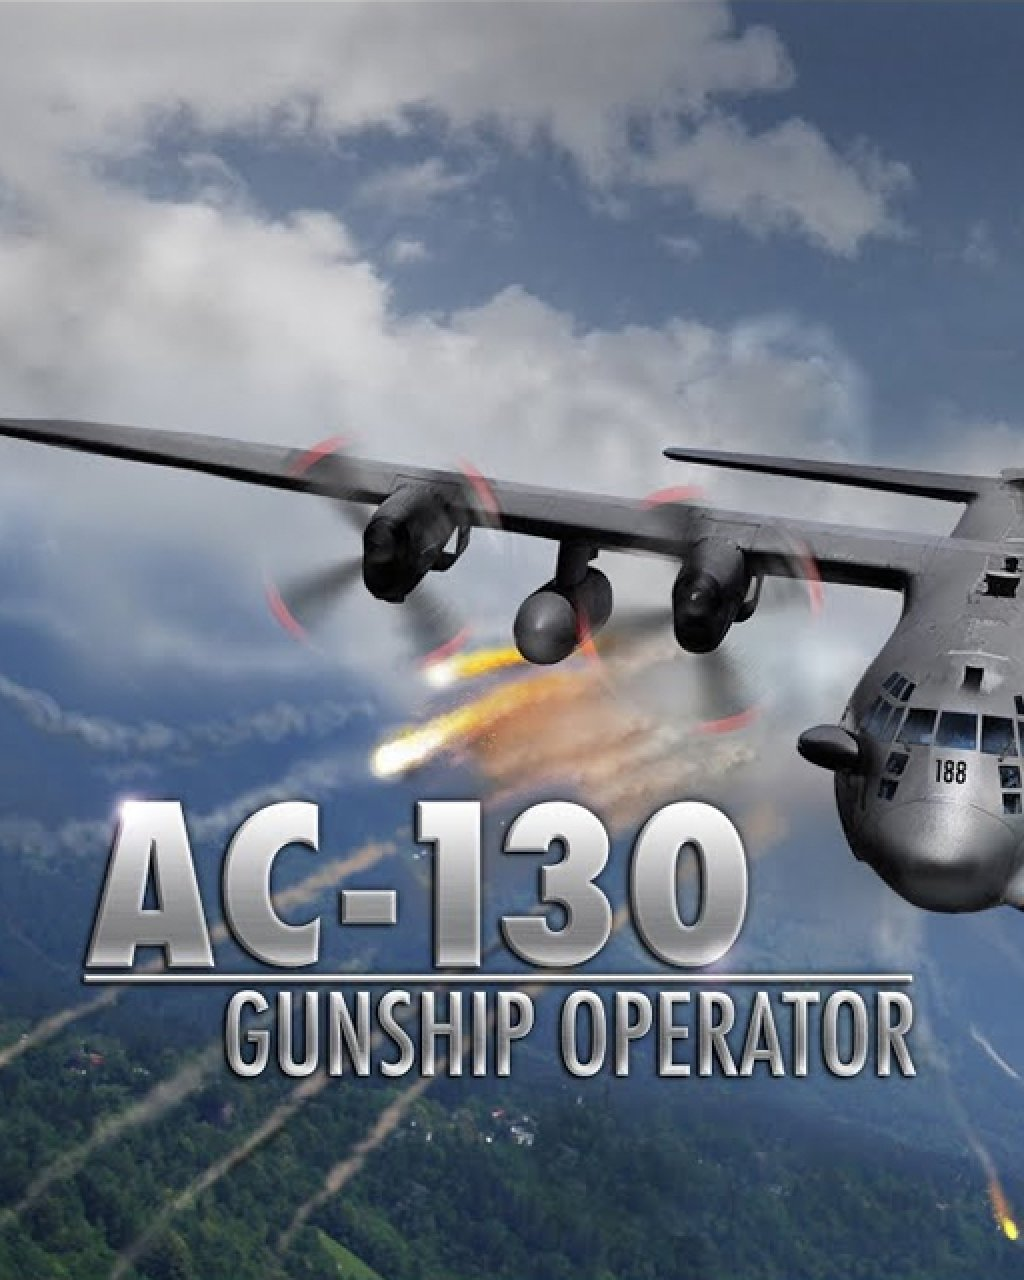 AC-130 Gunship Operator